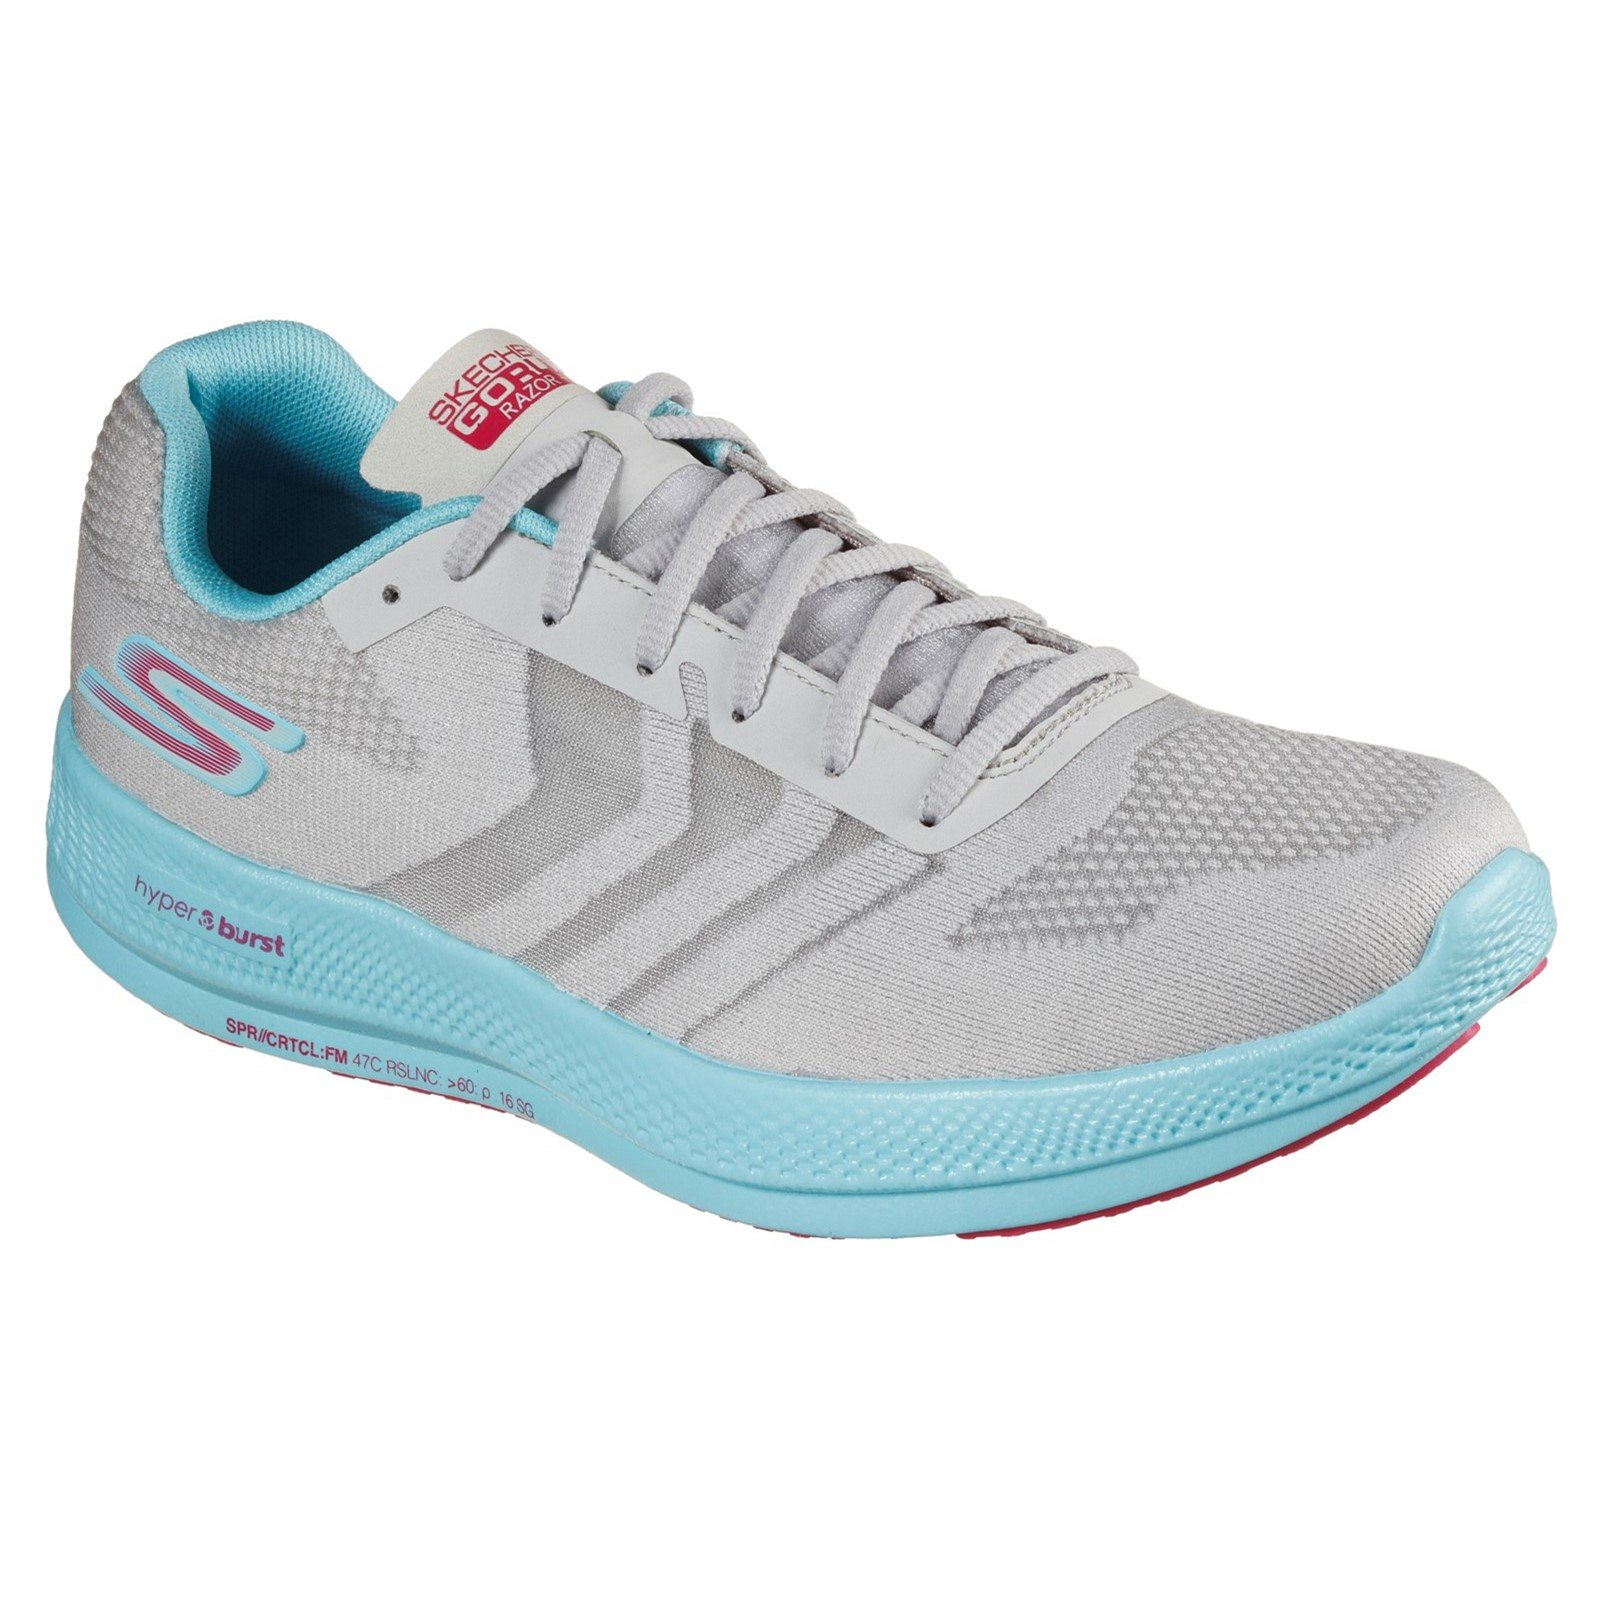 Skechers Women's Go Run Razor Trainer Various Colours 32703 - Grey/Aqua/Pink 7